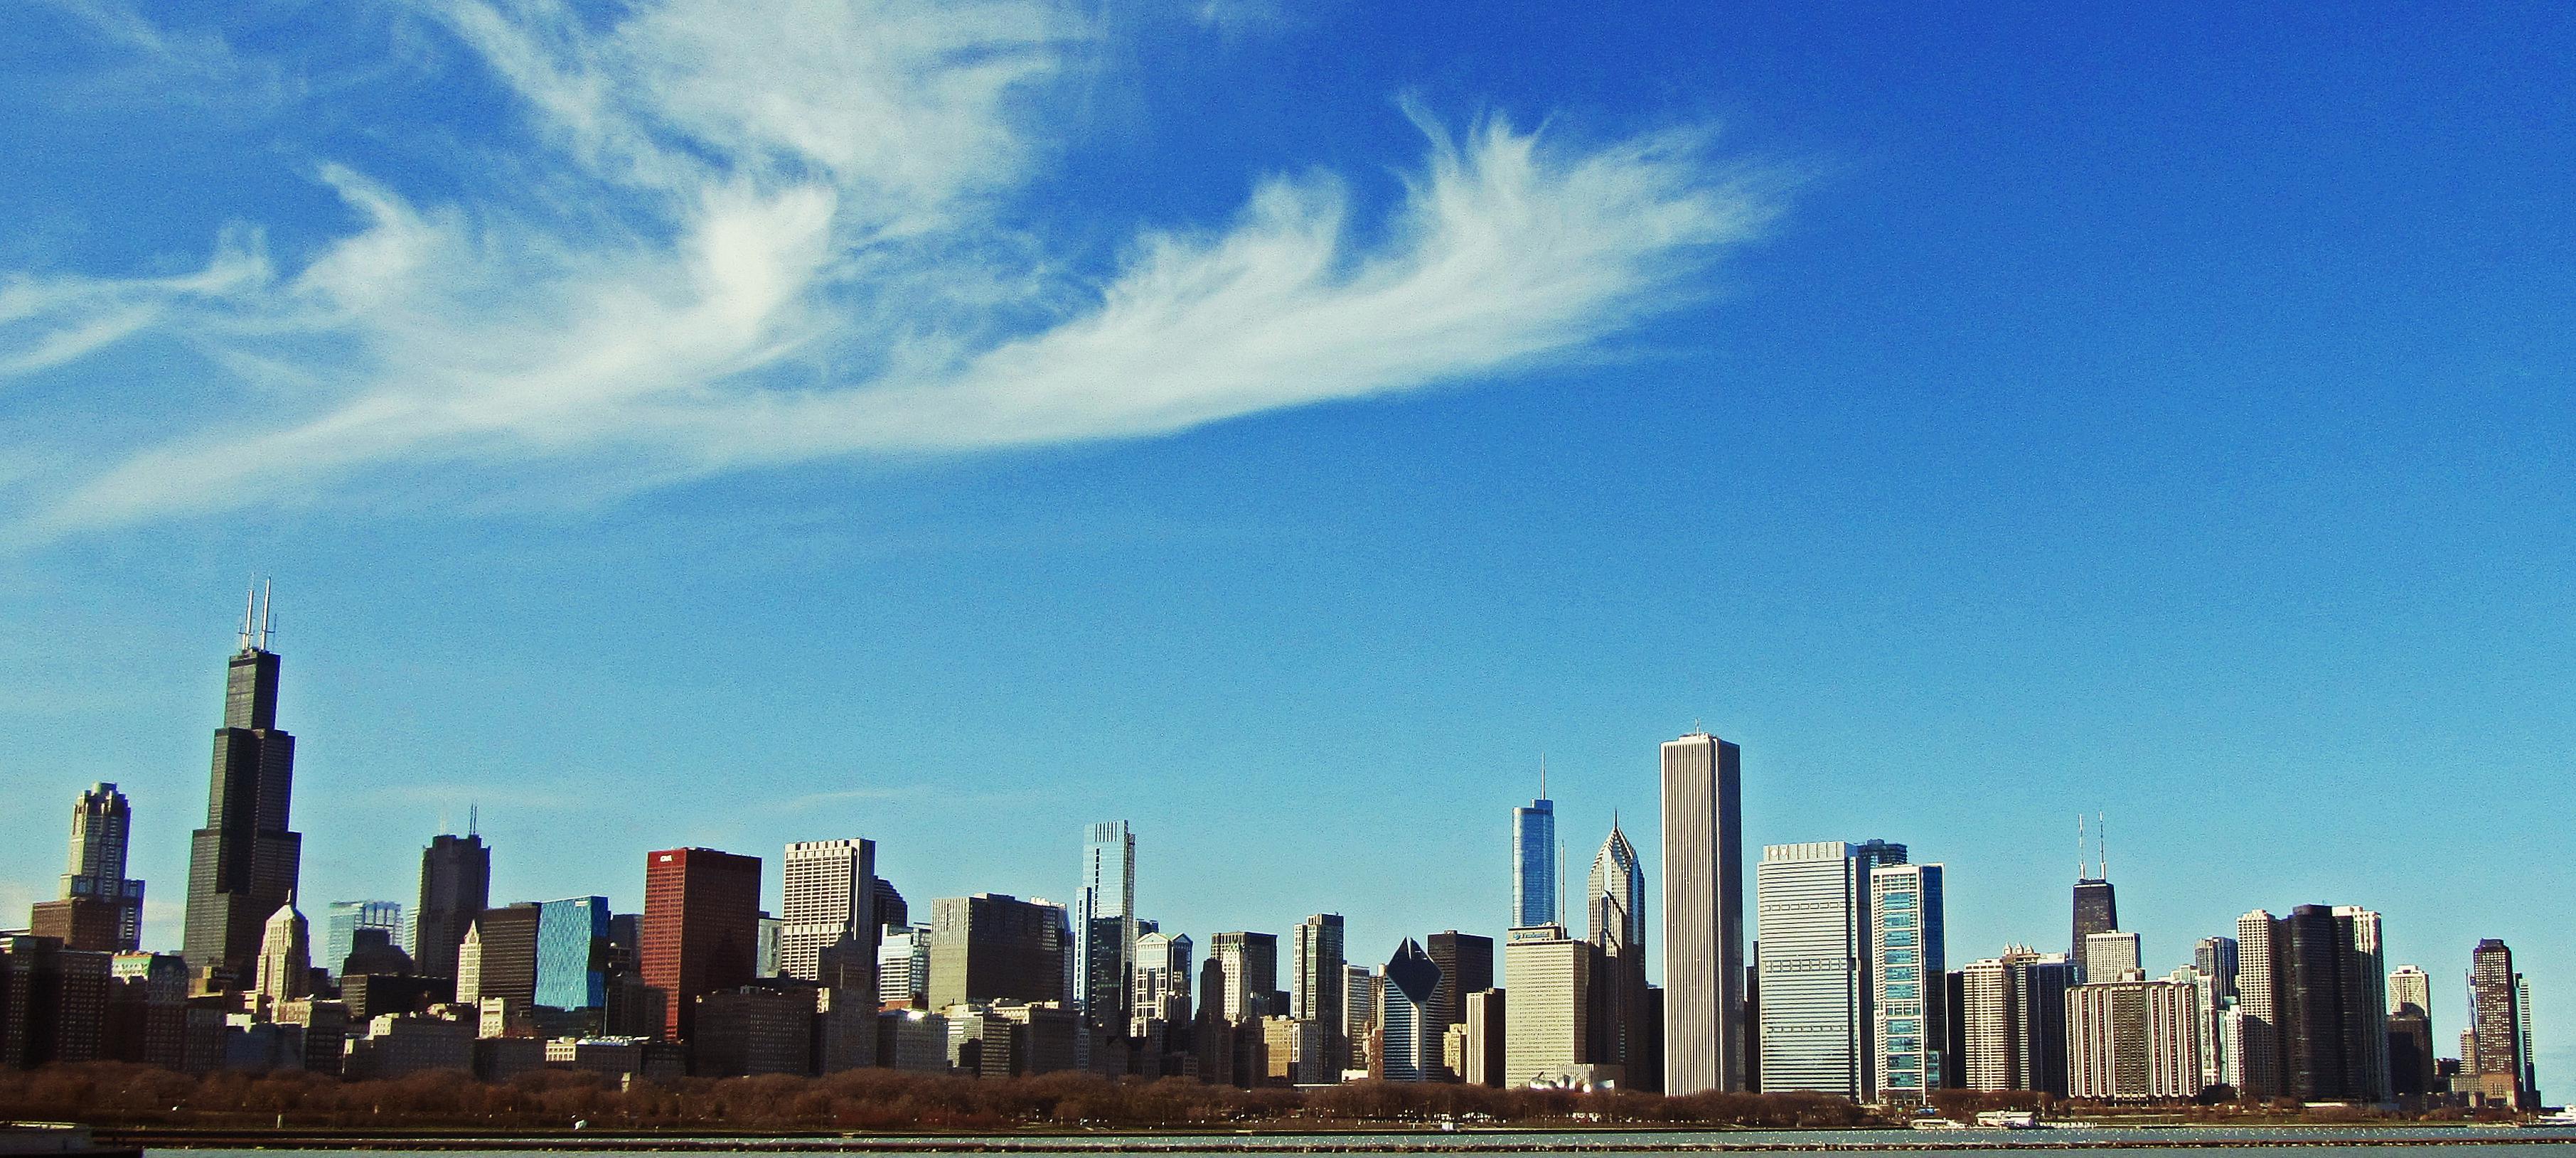 Chicago Skyline 4 by tundra-timmy